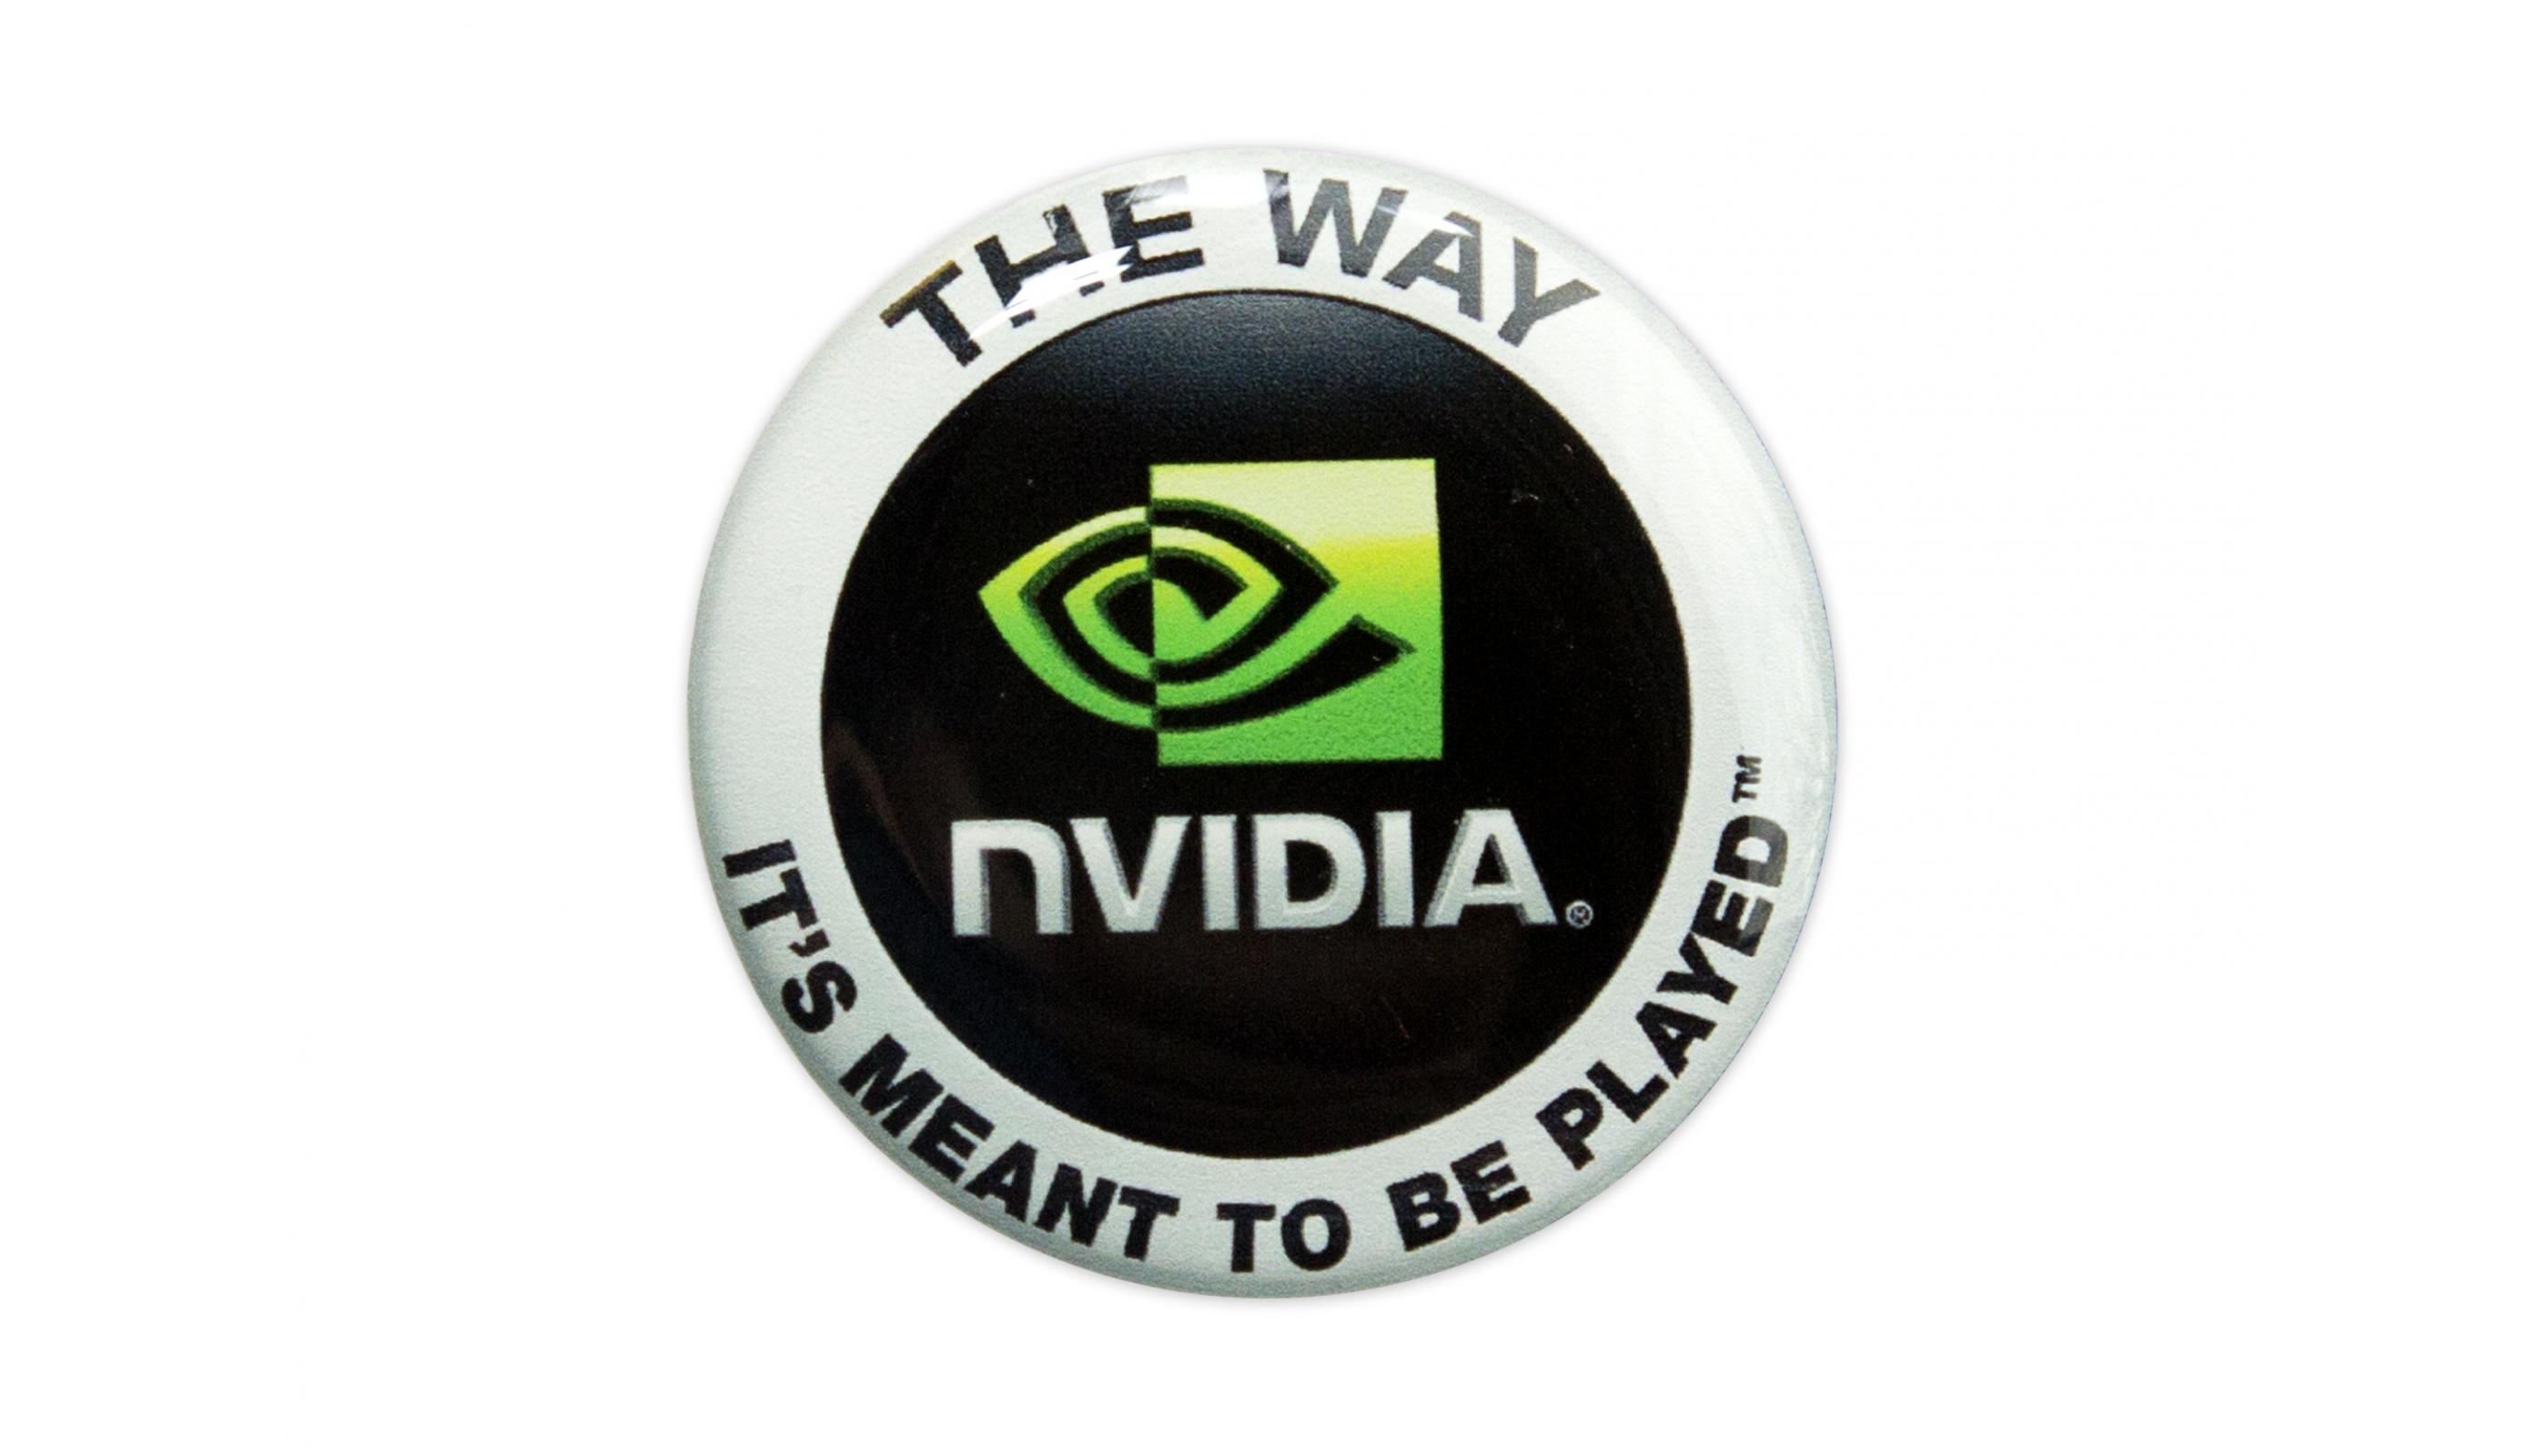 NVIDIA round domed emblem